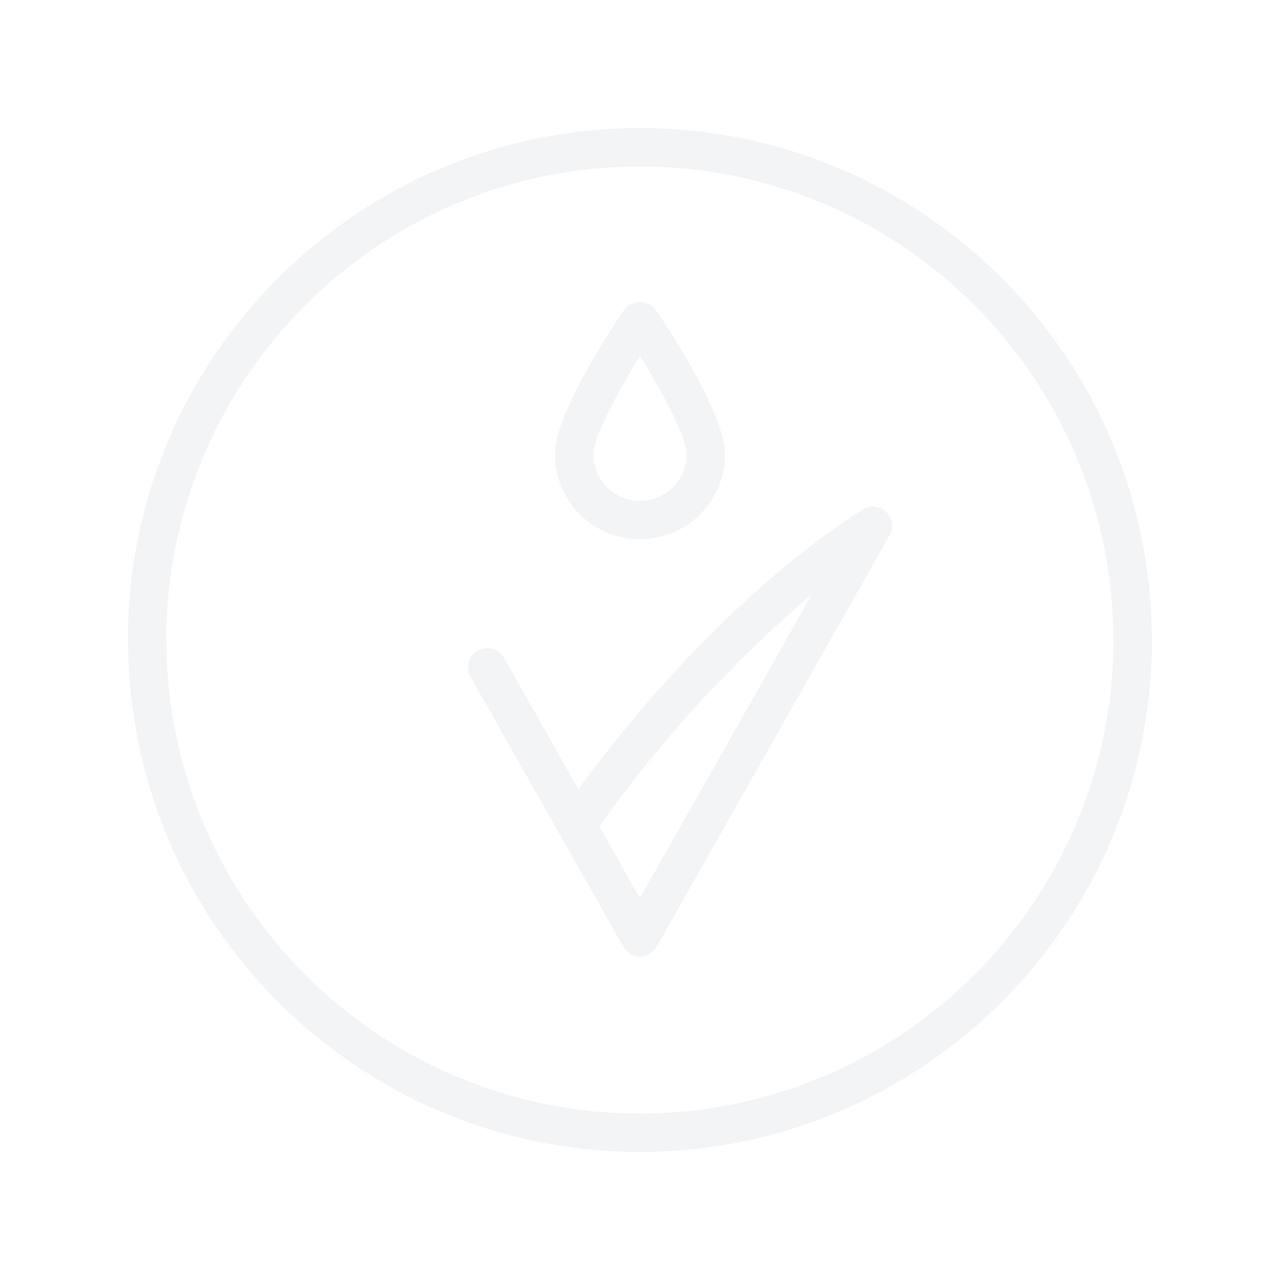 MAKEUP REVOLUTION Freedom Pro Correct Palette 6g